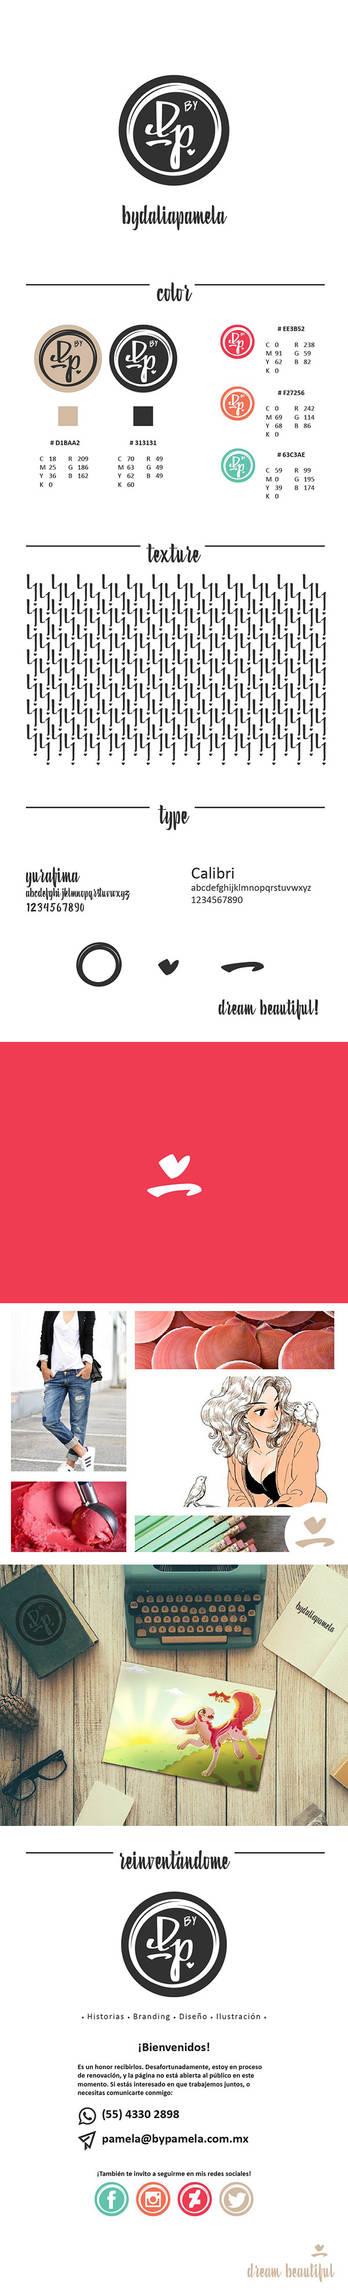 byDaliaPamela brand guide